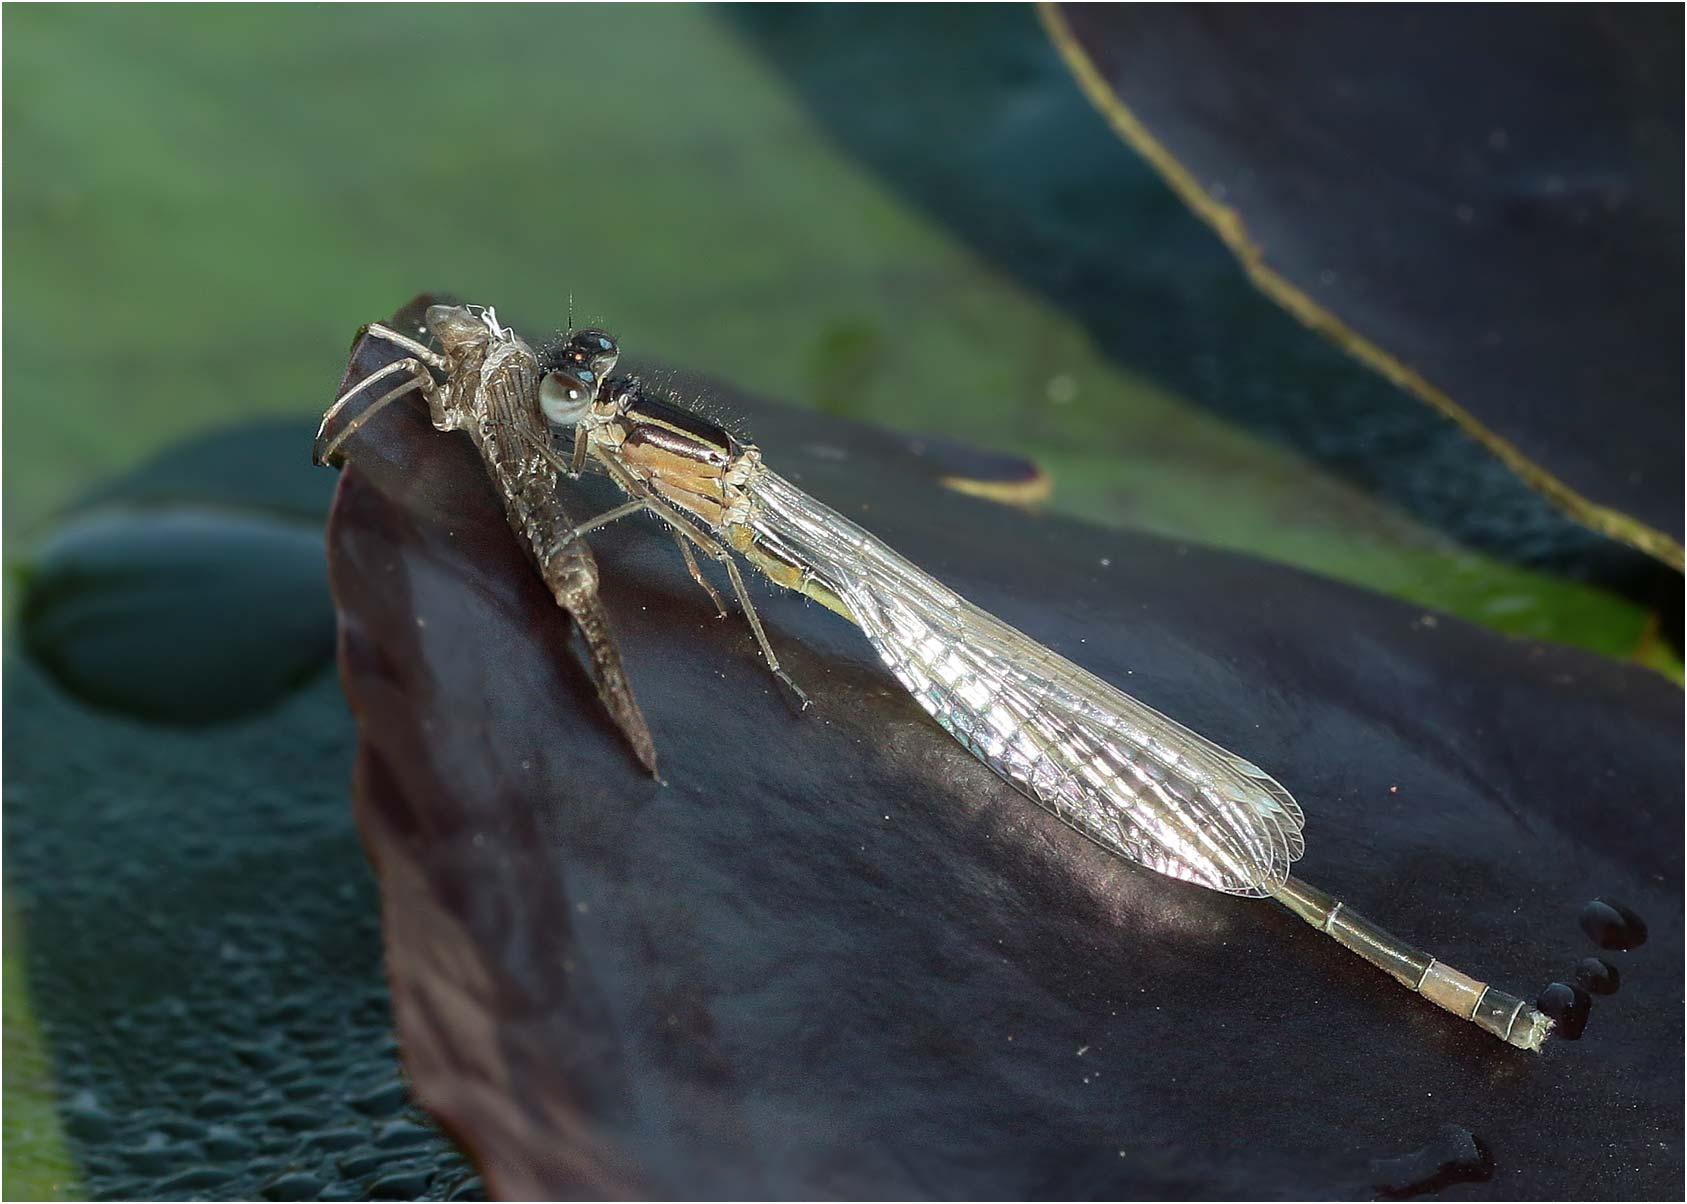 Émergence tardive d'un Ischnura elegans mâle, Beaupréau (France - 49)